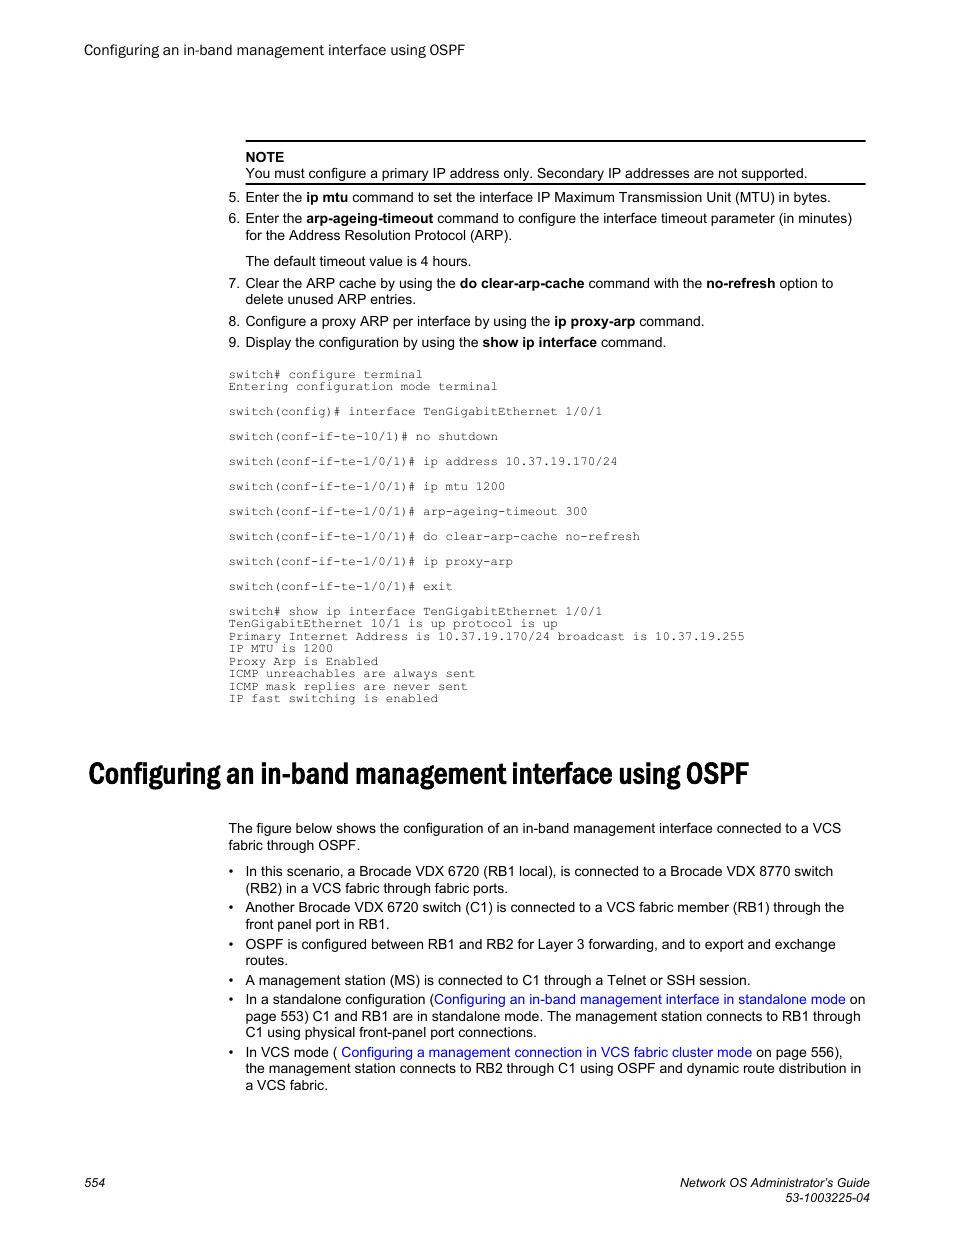 Brocade Network OS Administrator's Guide v4 1 1 User Manual